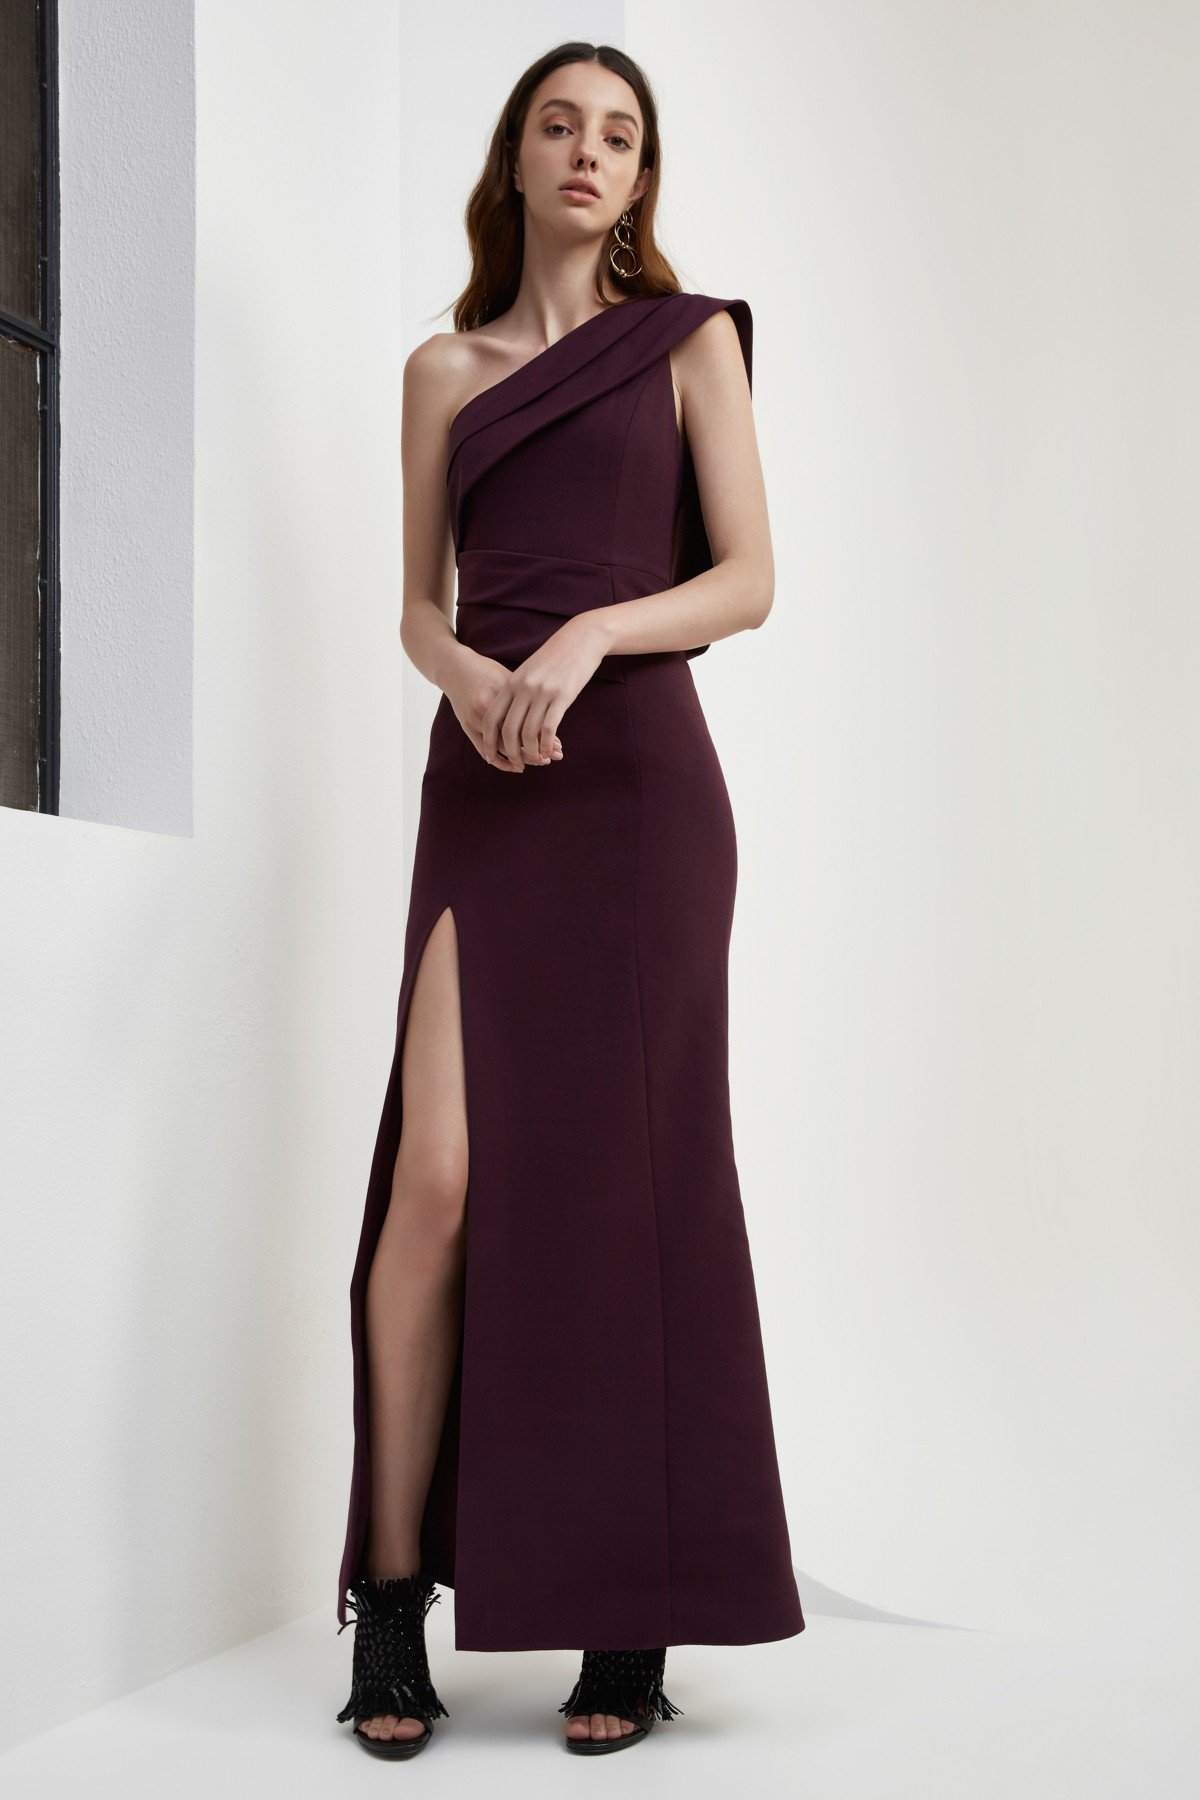 Shop C/MEO Don't Stop Full Length Dress.